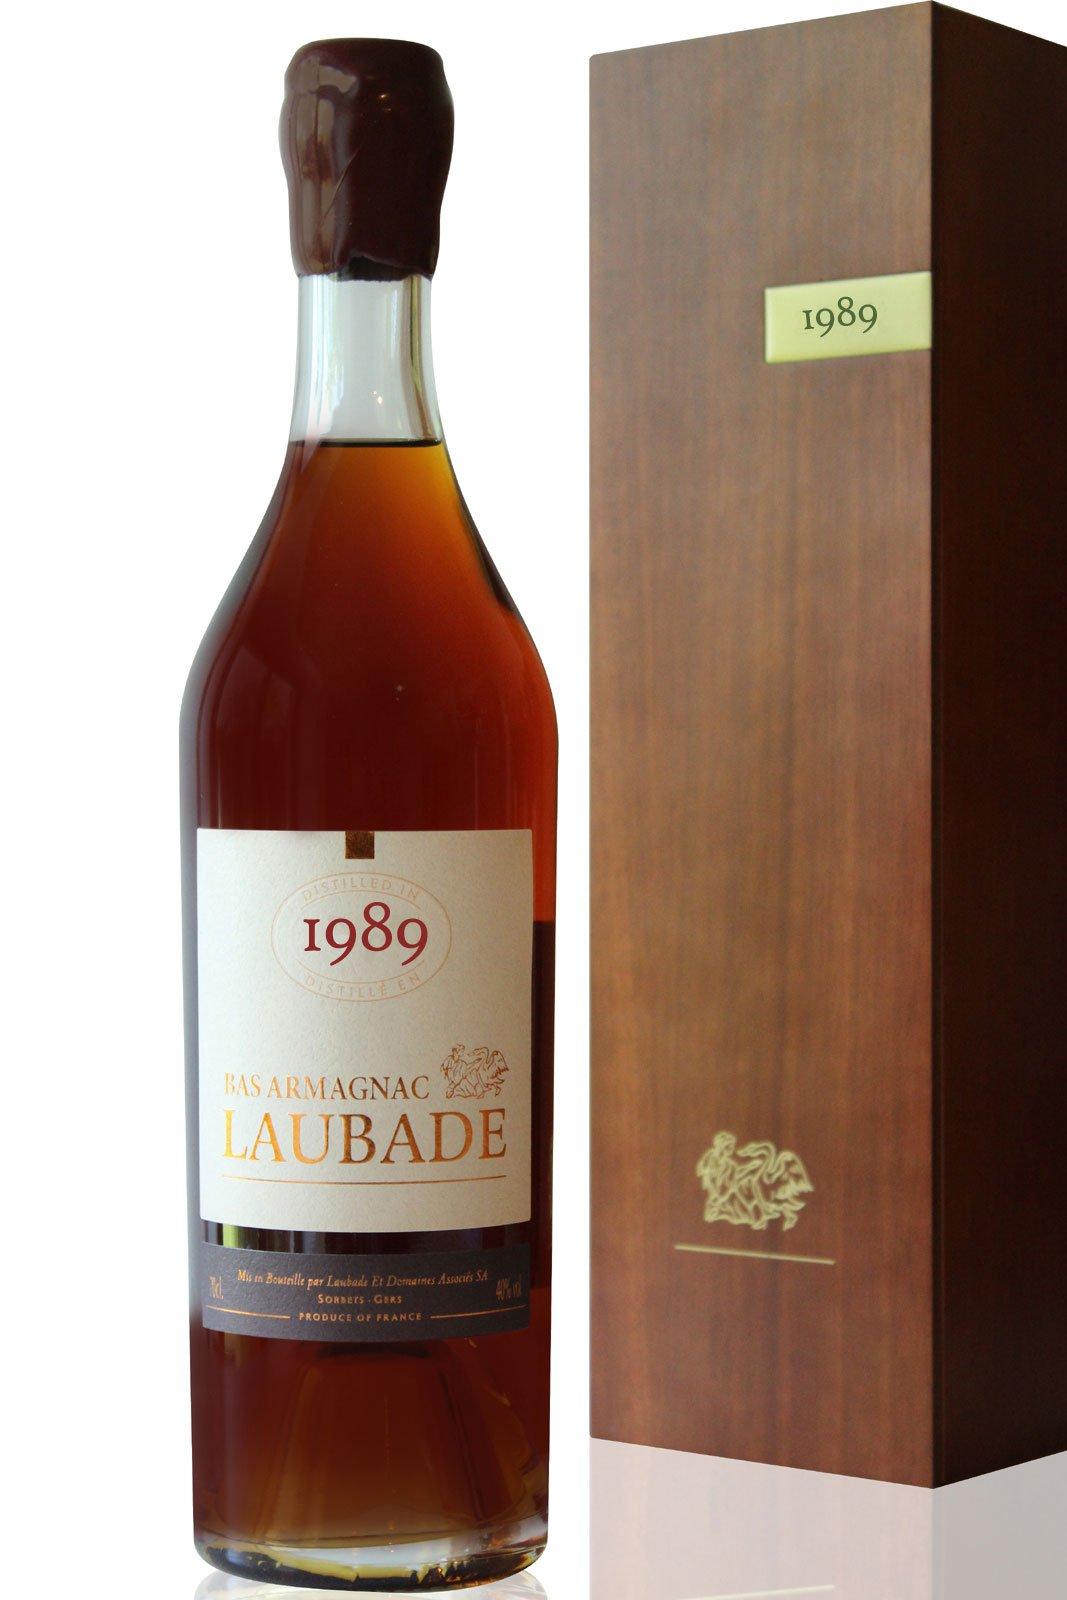 Armagnac-Chteau-de-laubade-Millsime-1989-70cl